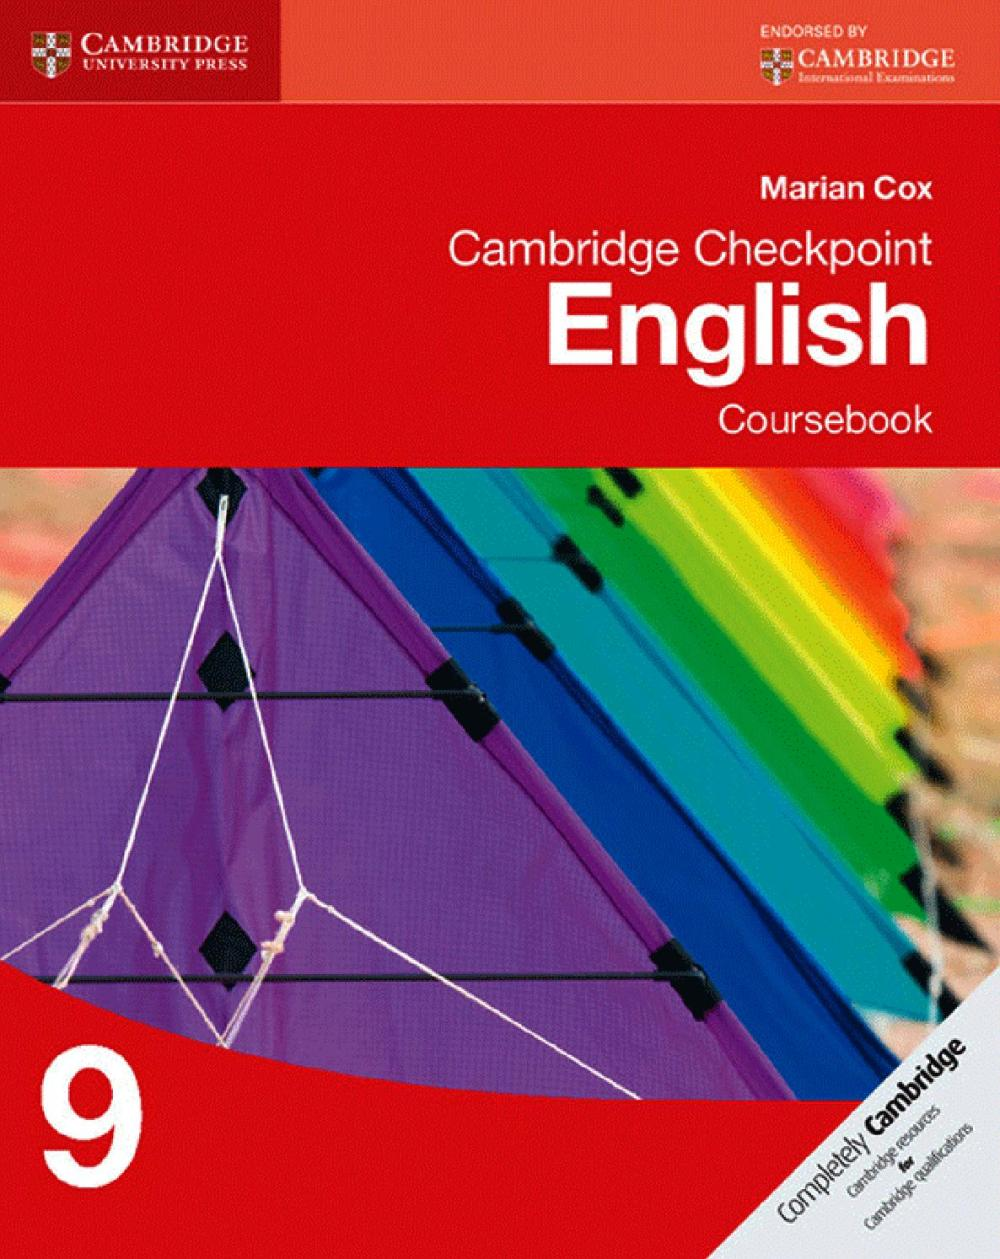 medium resolution of Cambridge Checkpoint English Coursebook 9 by Cambridge University Press  Education - issuu